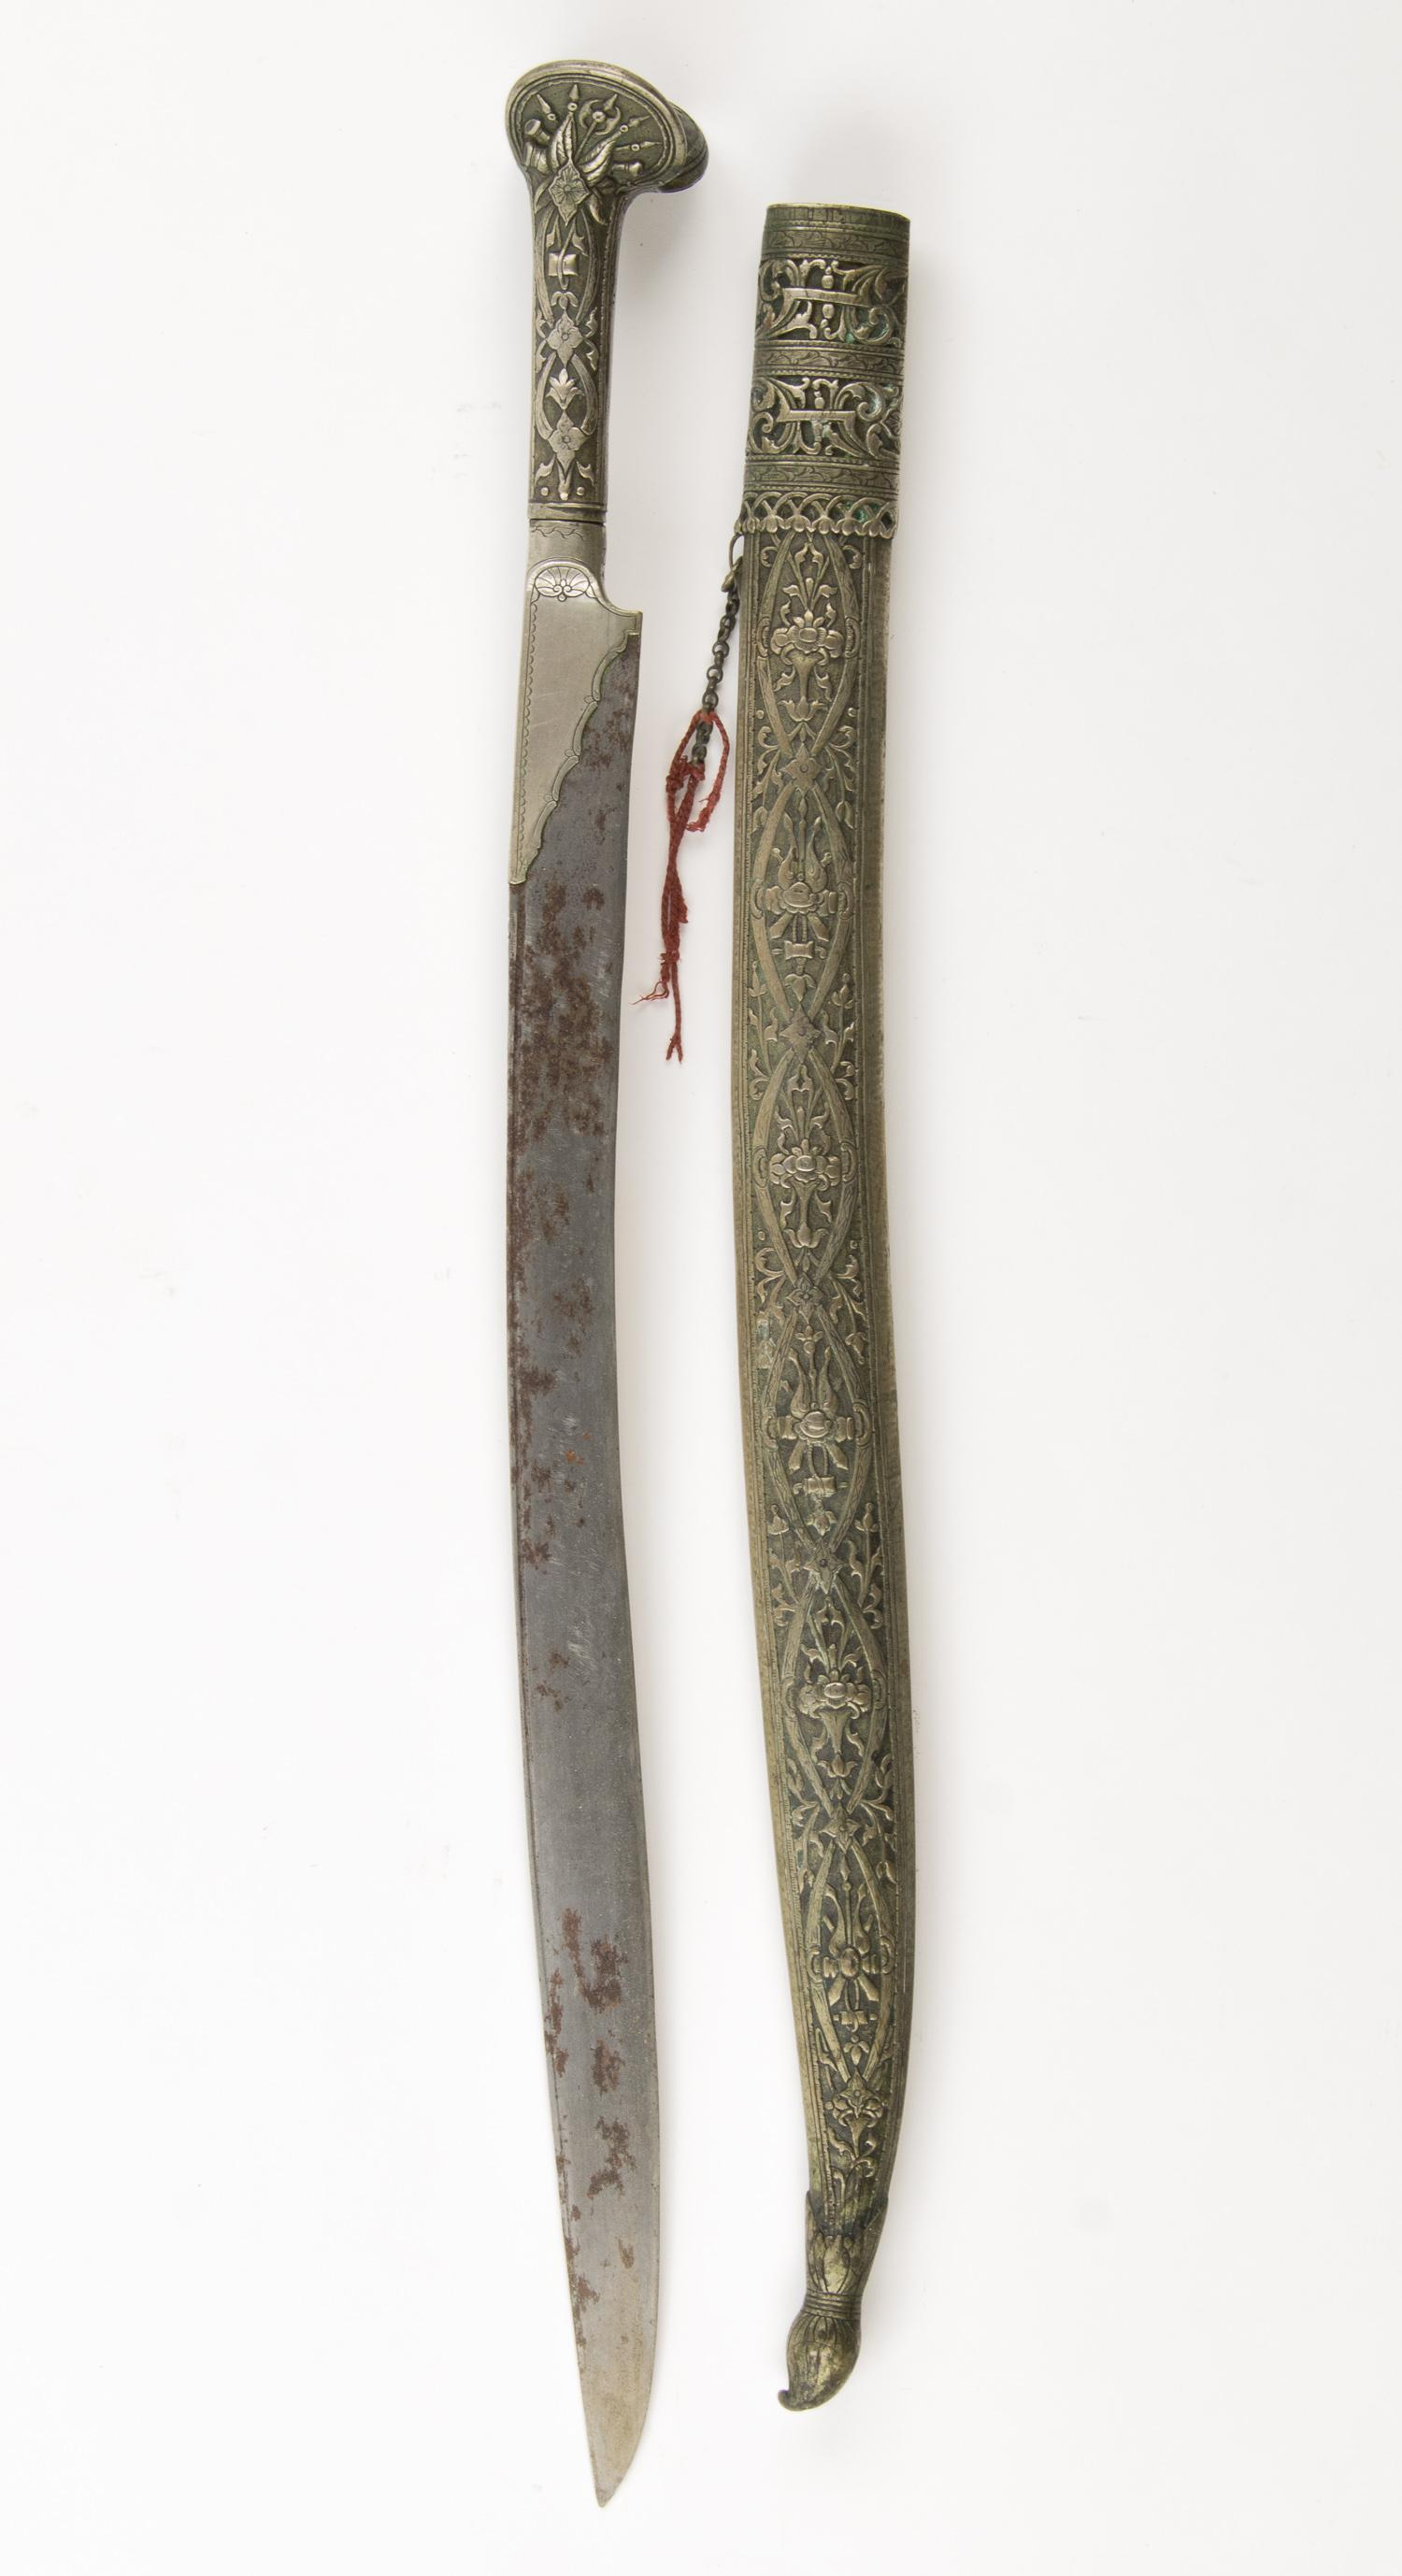 OTTOMAN EMPIRE (BALKAN) YATAGAN SWORD